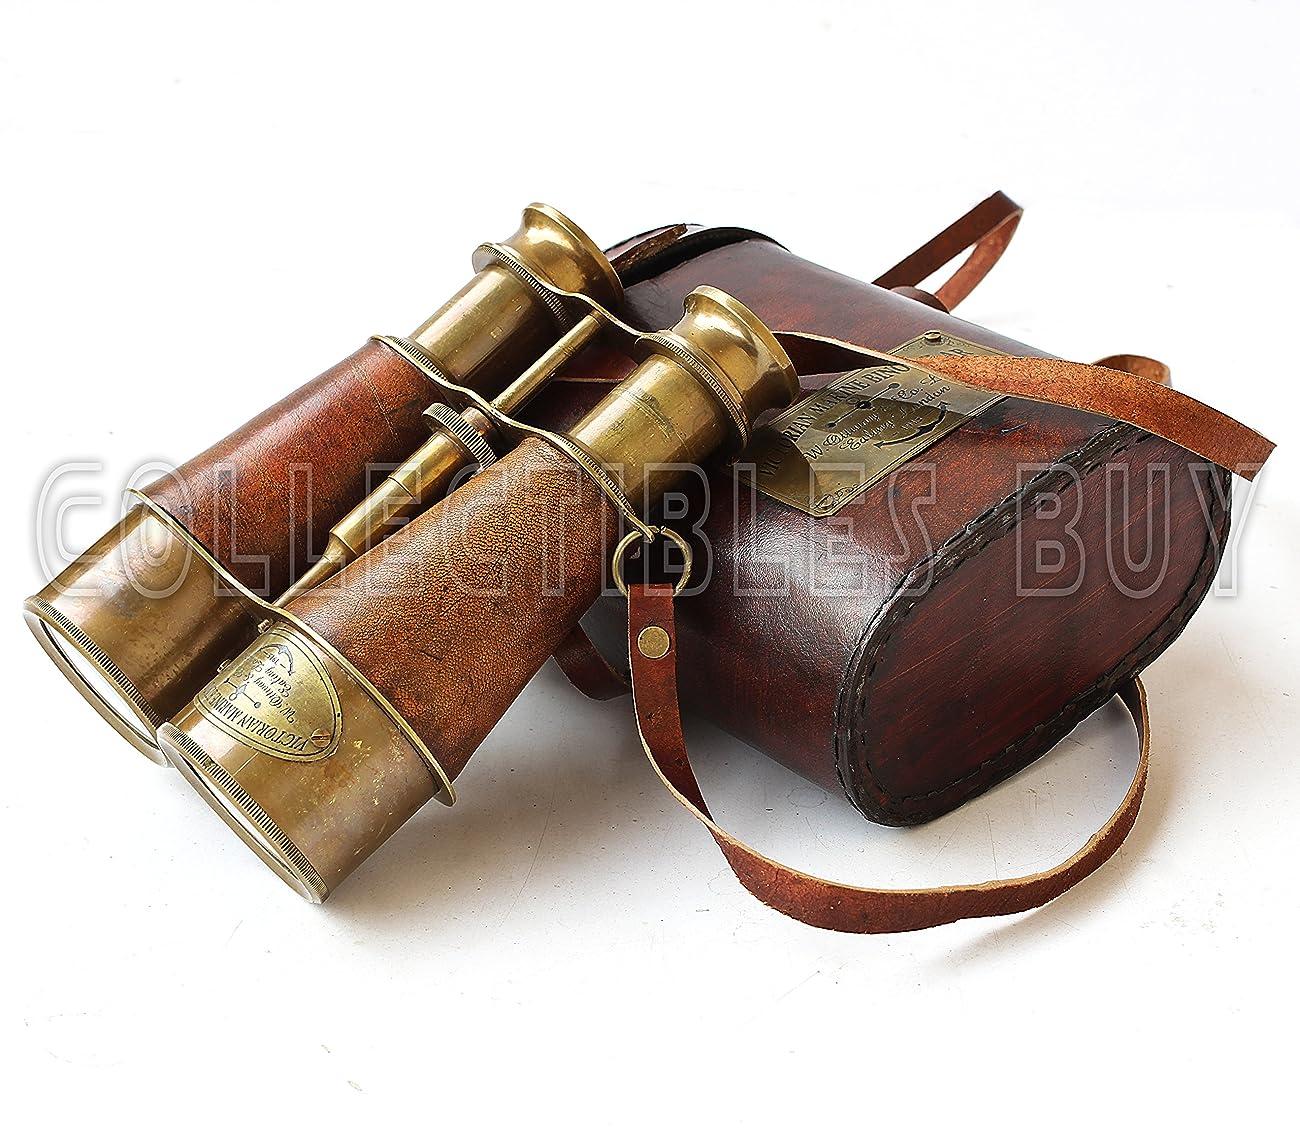 Victorian Marine Brass Leather Binocular Sailor Instrument London 1915 2